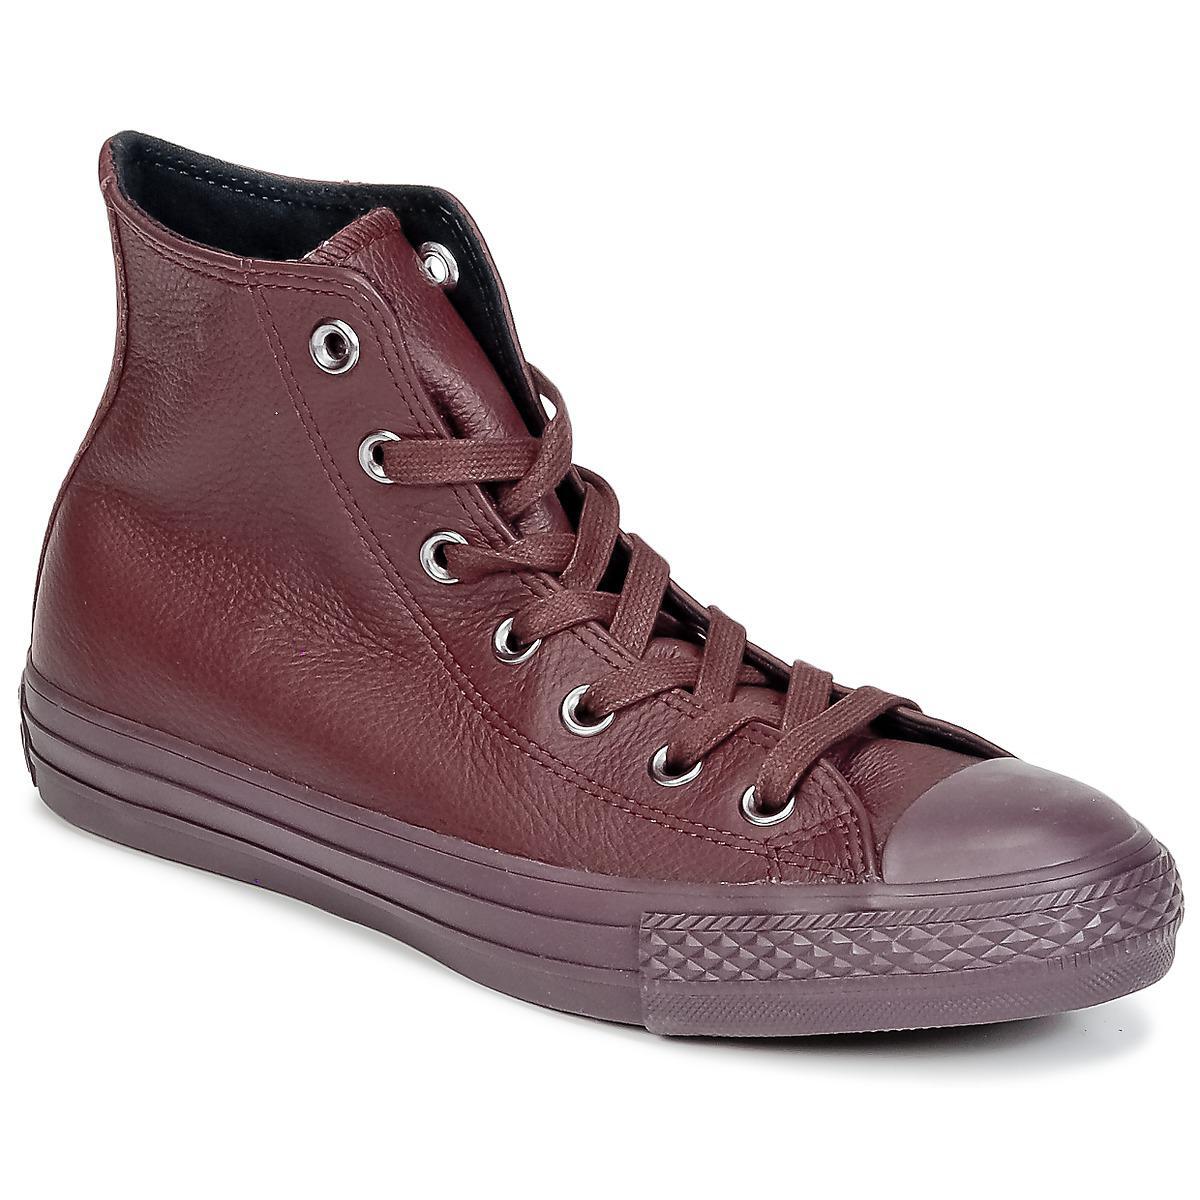 ce688365cc3b Converse Chuck Taylor All Star Mono Cuir Men s Shoes (high-top ...